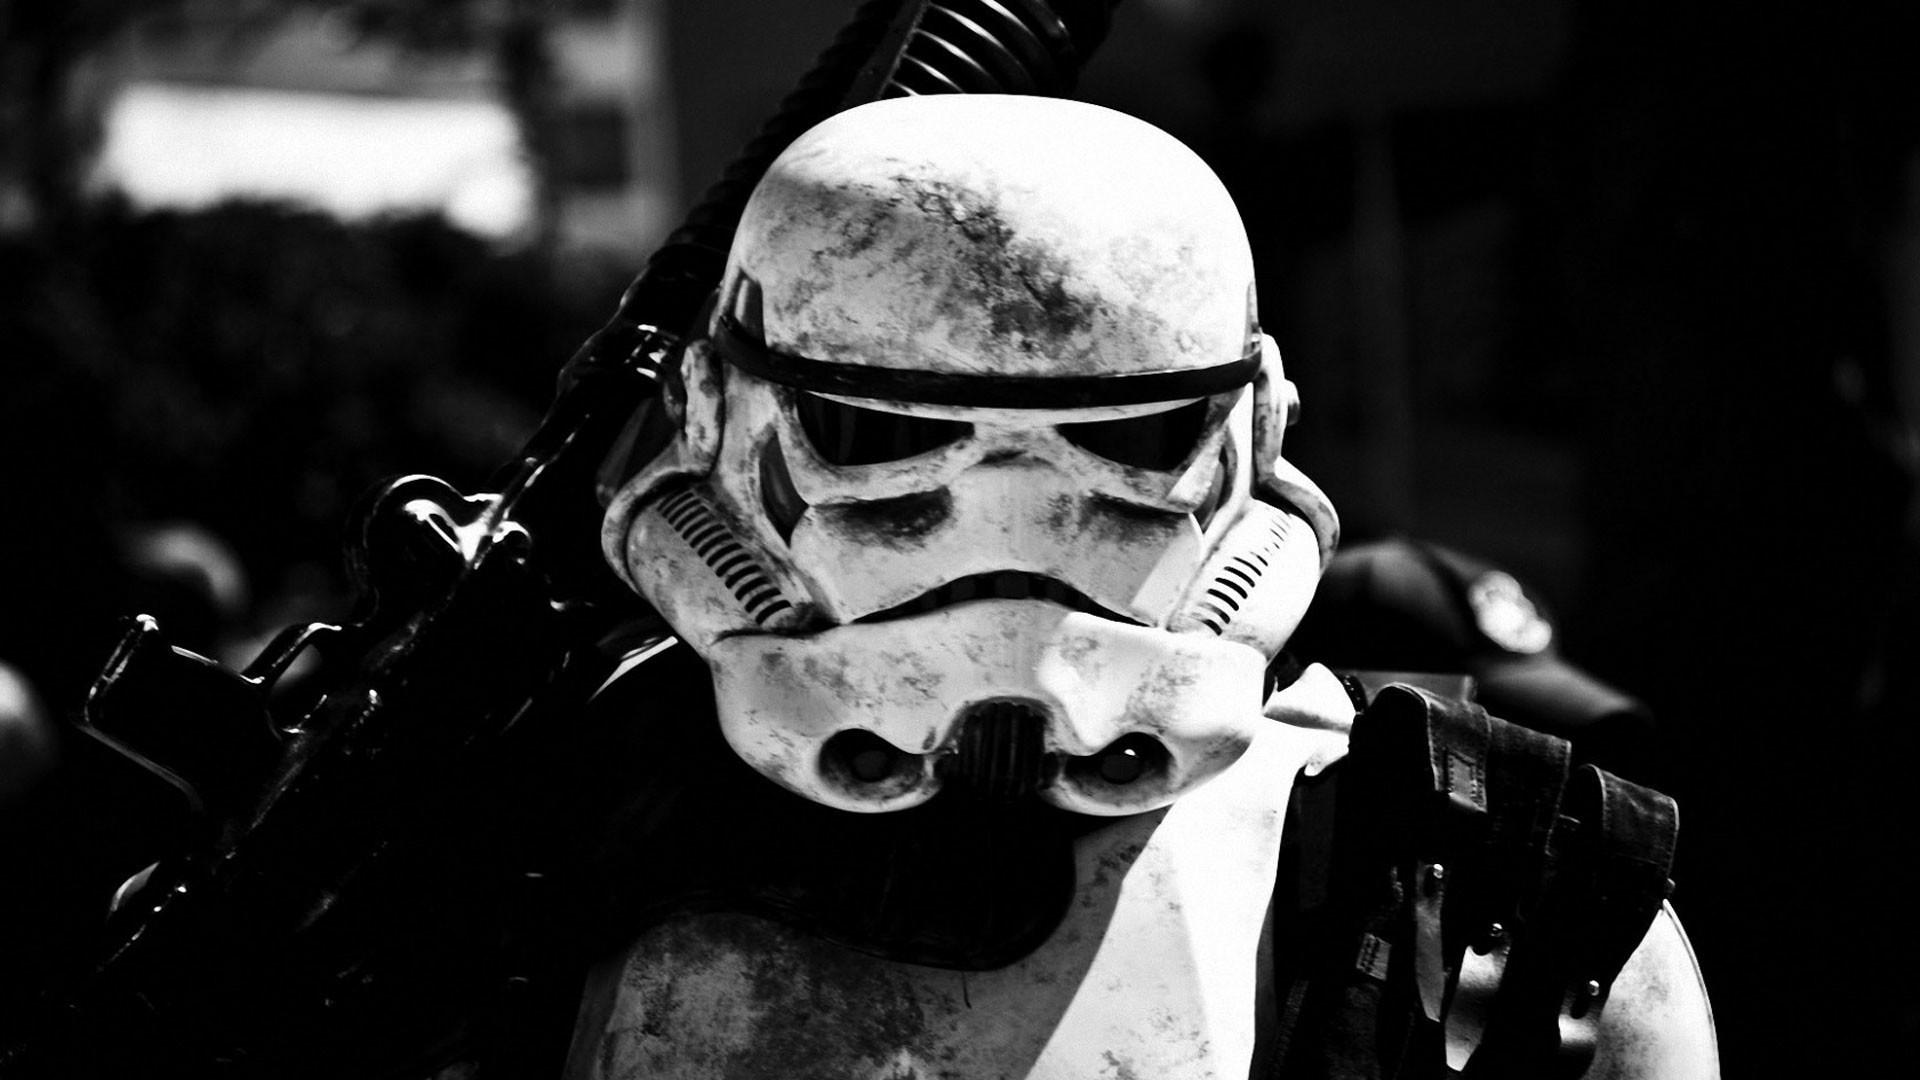 Res: 1920x1080, wars helmet dark Wallpaper HD Wallpapers Full HD 1080p Download